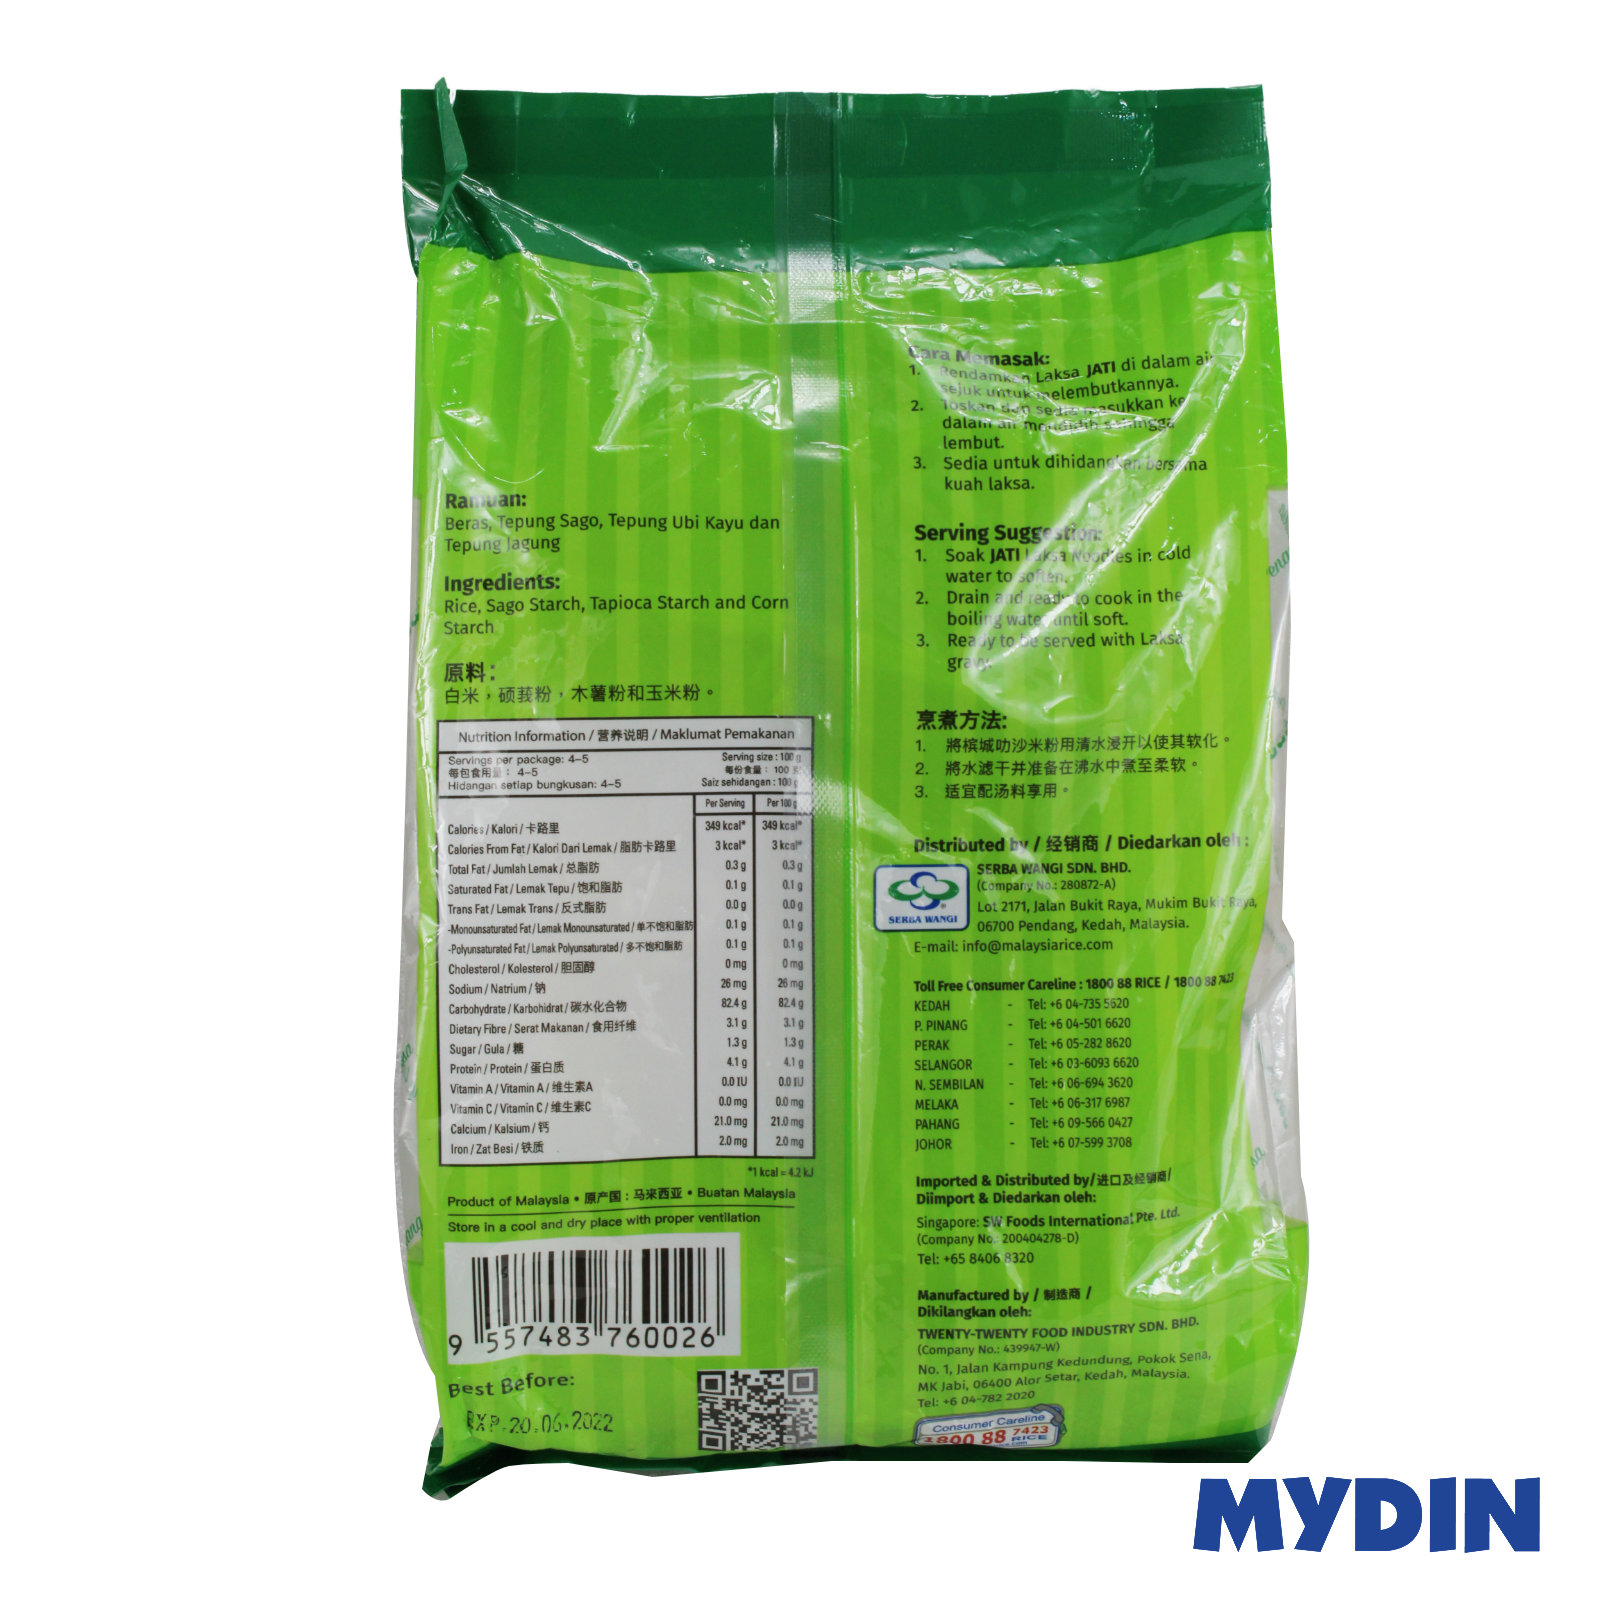 Jati Penang Laksa Rice Noodle (450g)